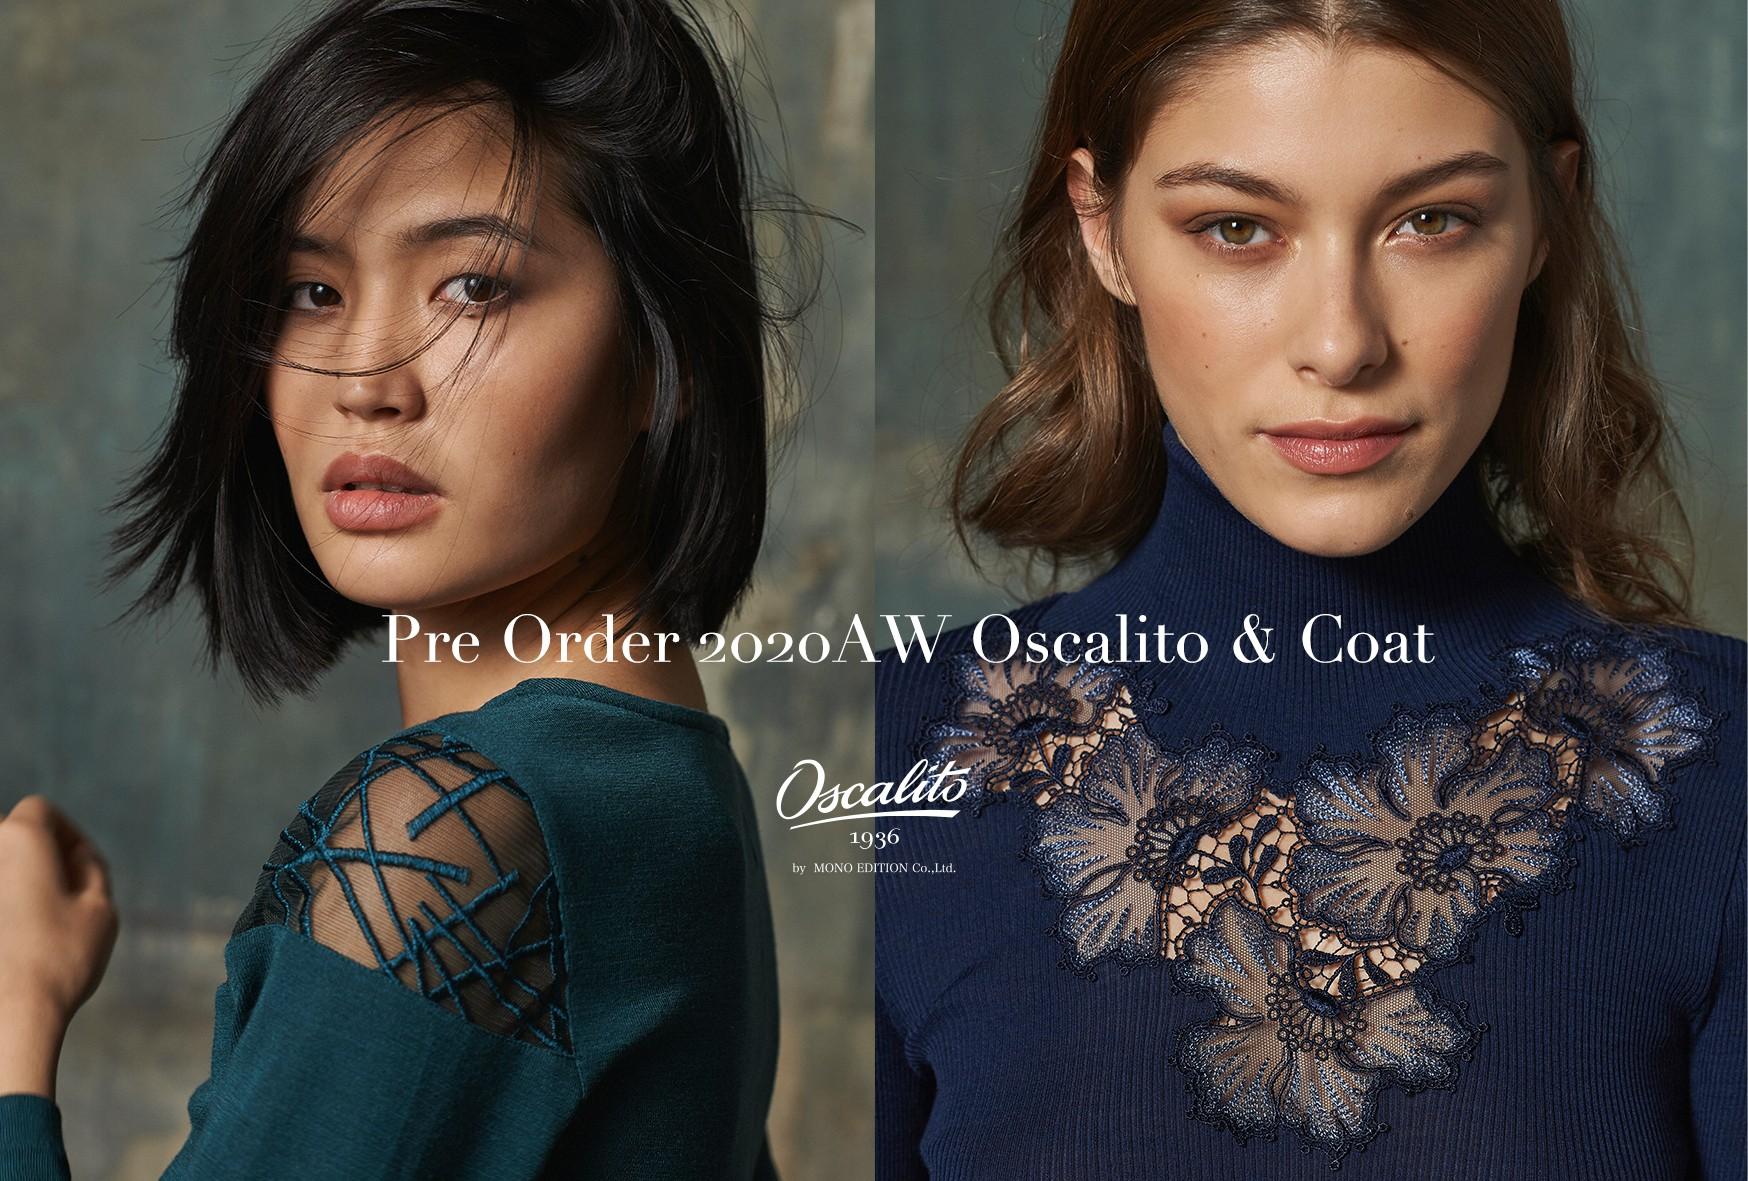 Oscalito & Coat Pre Order 2020AW オスカリート&コート 受注会